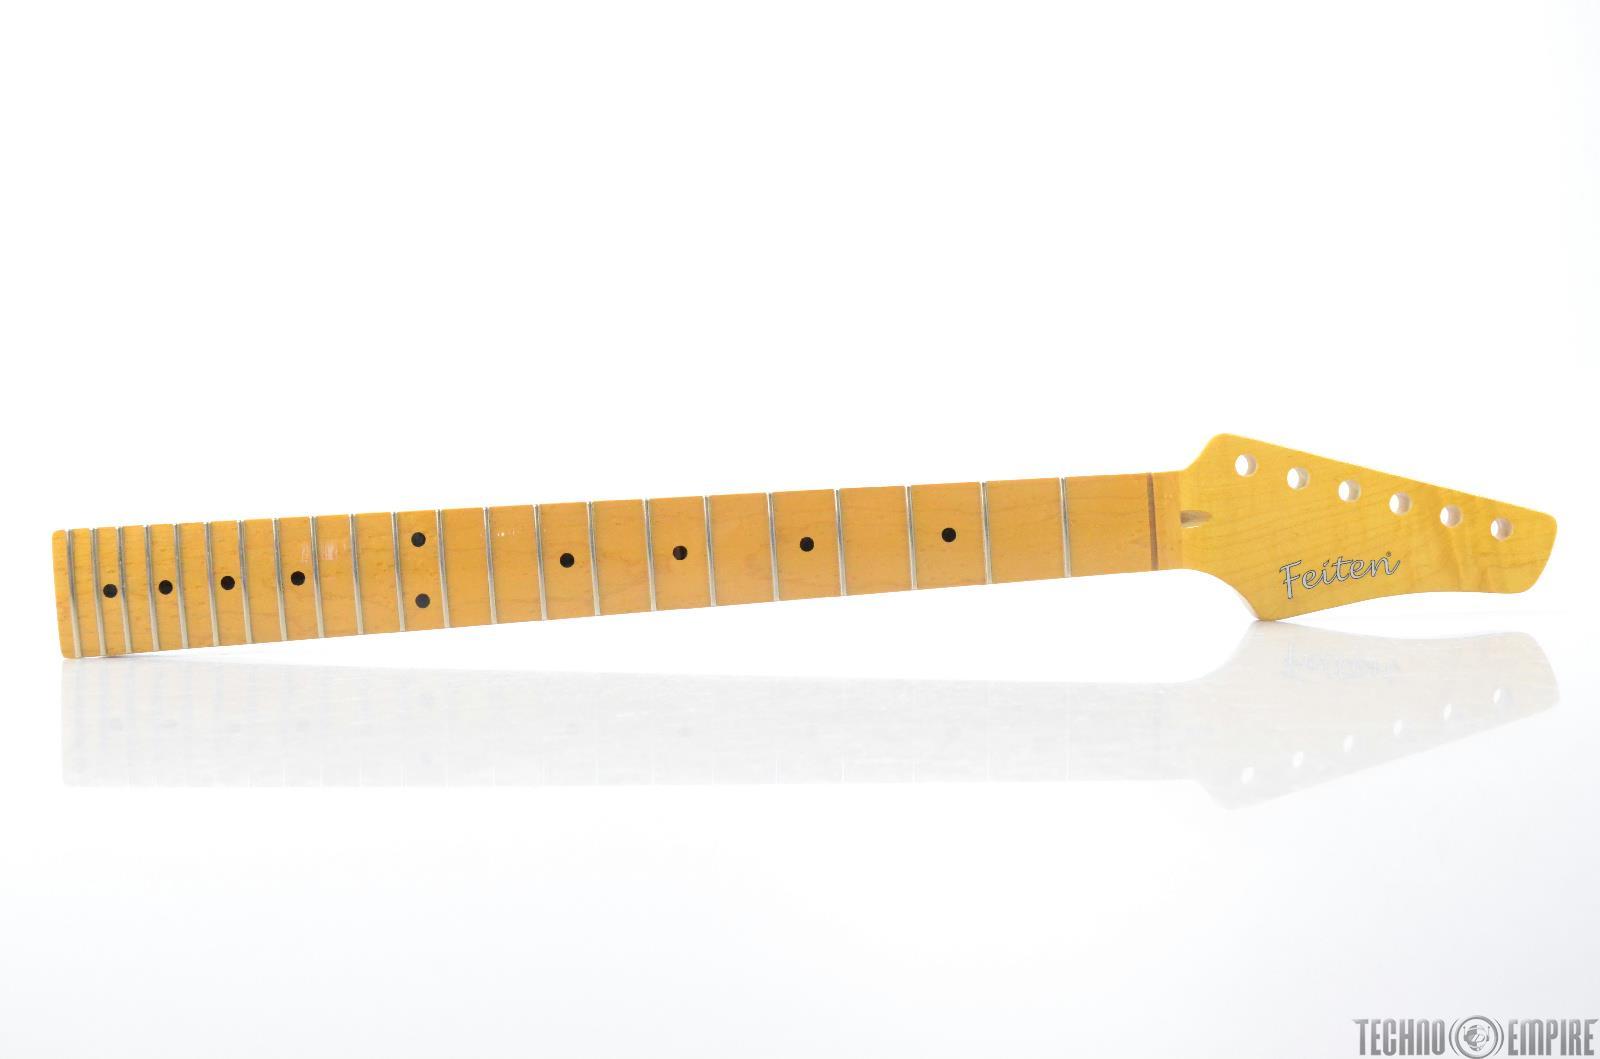 Buzz Feiten Maple Electric Guitar Neck Birdseye Fretboard Nashville Fat #28574